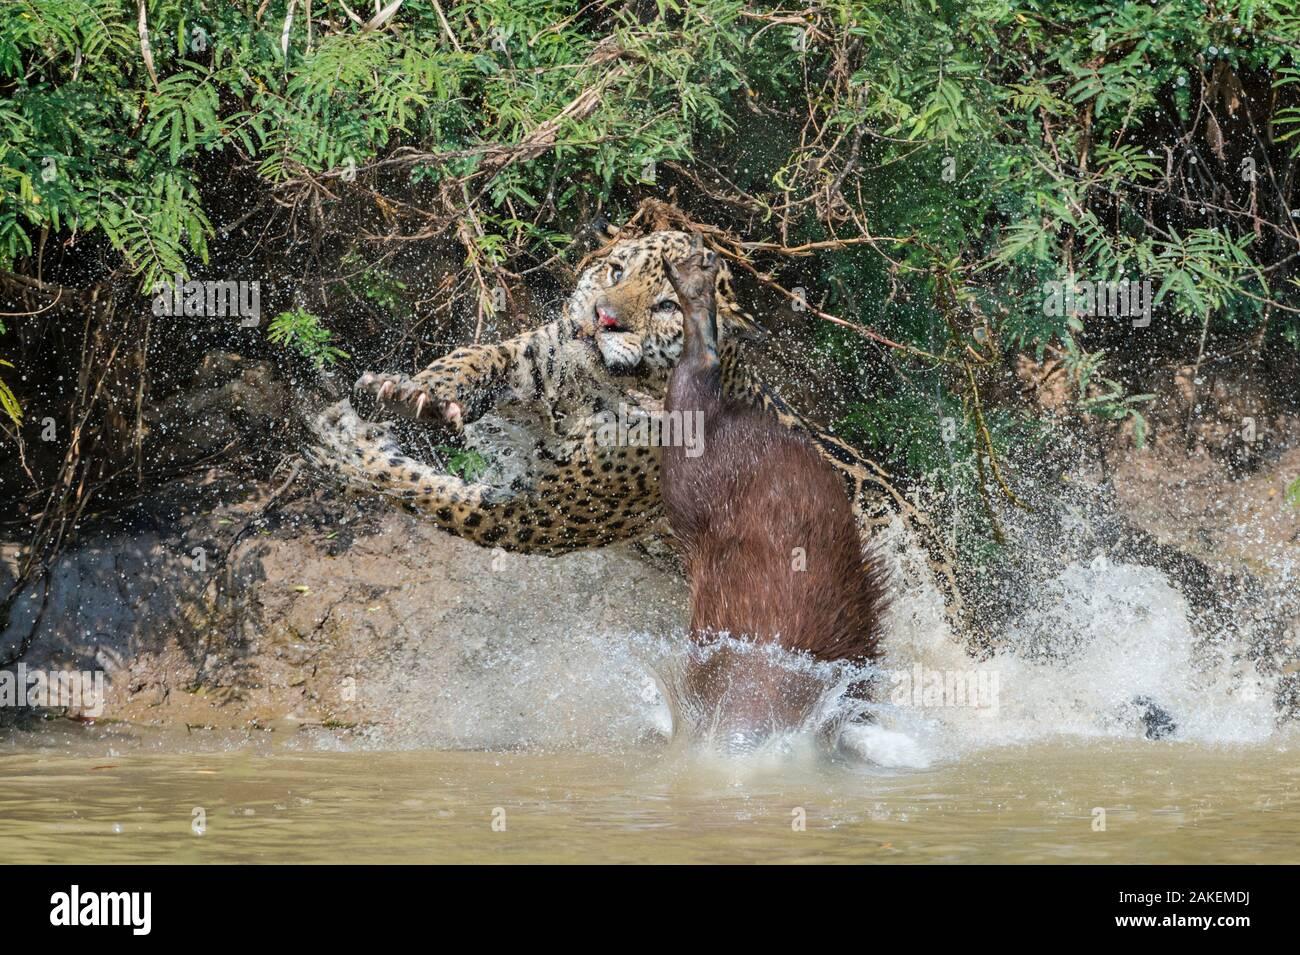 Jaguar (Panthera onca) male, hunting Capybara (Hydrochoerus hydrochaeris). The capybara jumping away has cut the nose of the Jaguar with its toenail. Cuiaba River, Pantanal Matogrossense National Park, Pantanal, Brazil. Sequence 3 of 3 Stock Photo